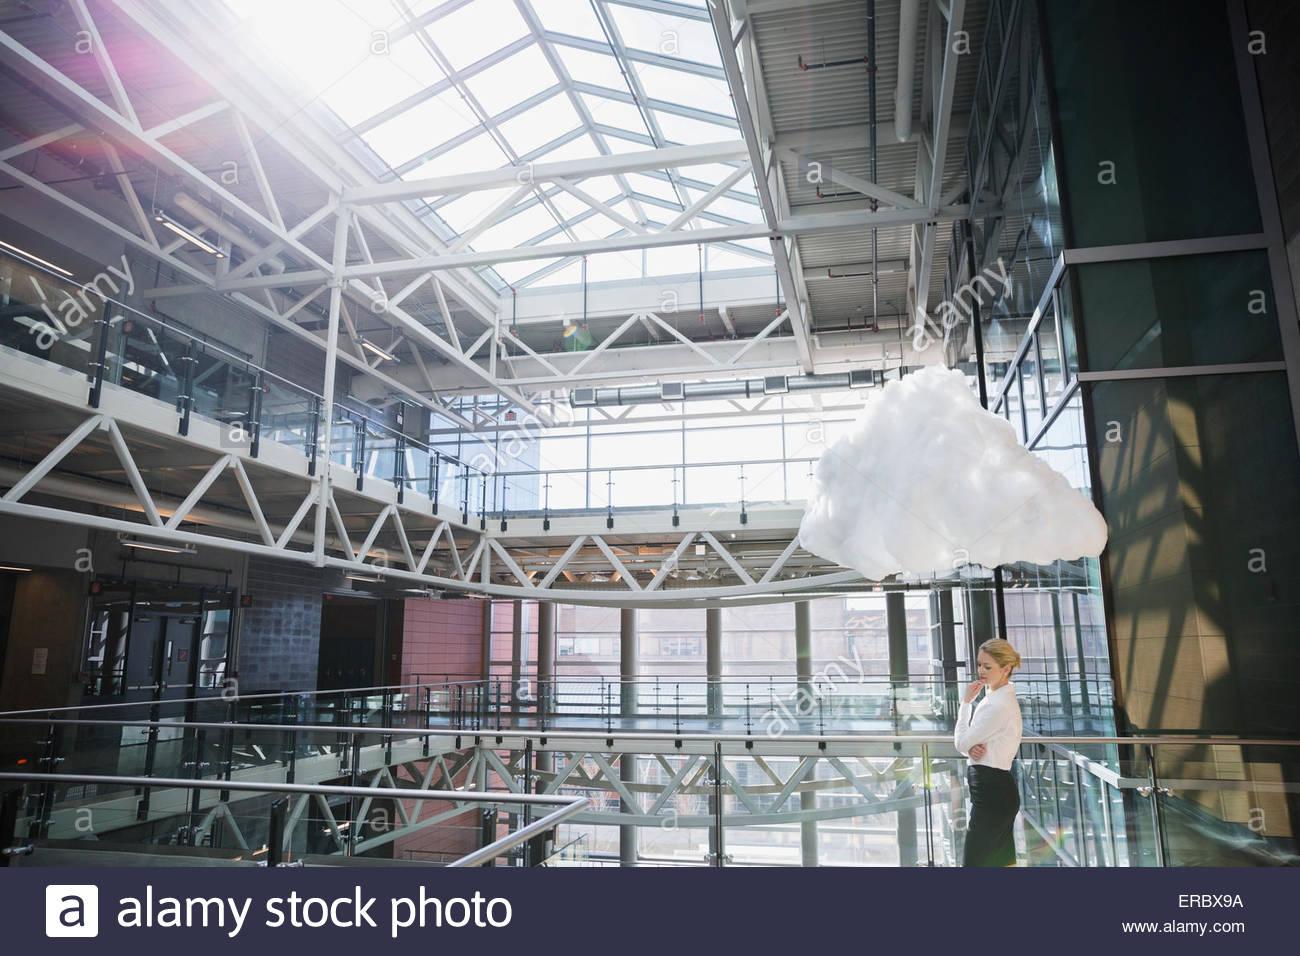 Cloud over pensive businesswoman in sunny atrium - Stock Image